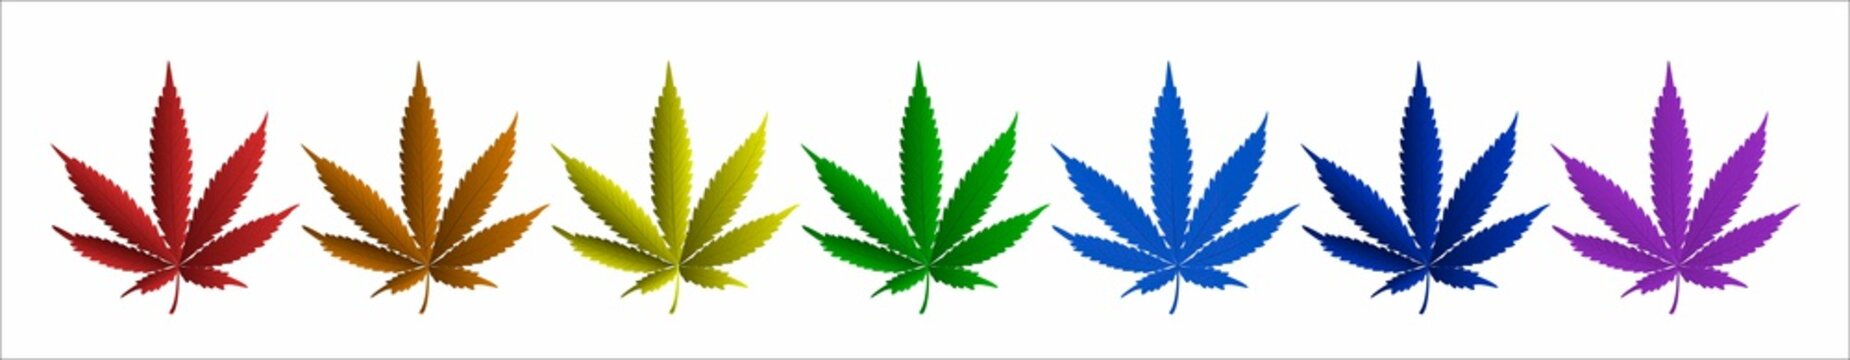 A set of marijuana sheets of all colors of the rainbow. LGBT concept. Vector.